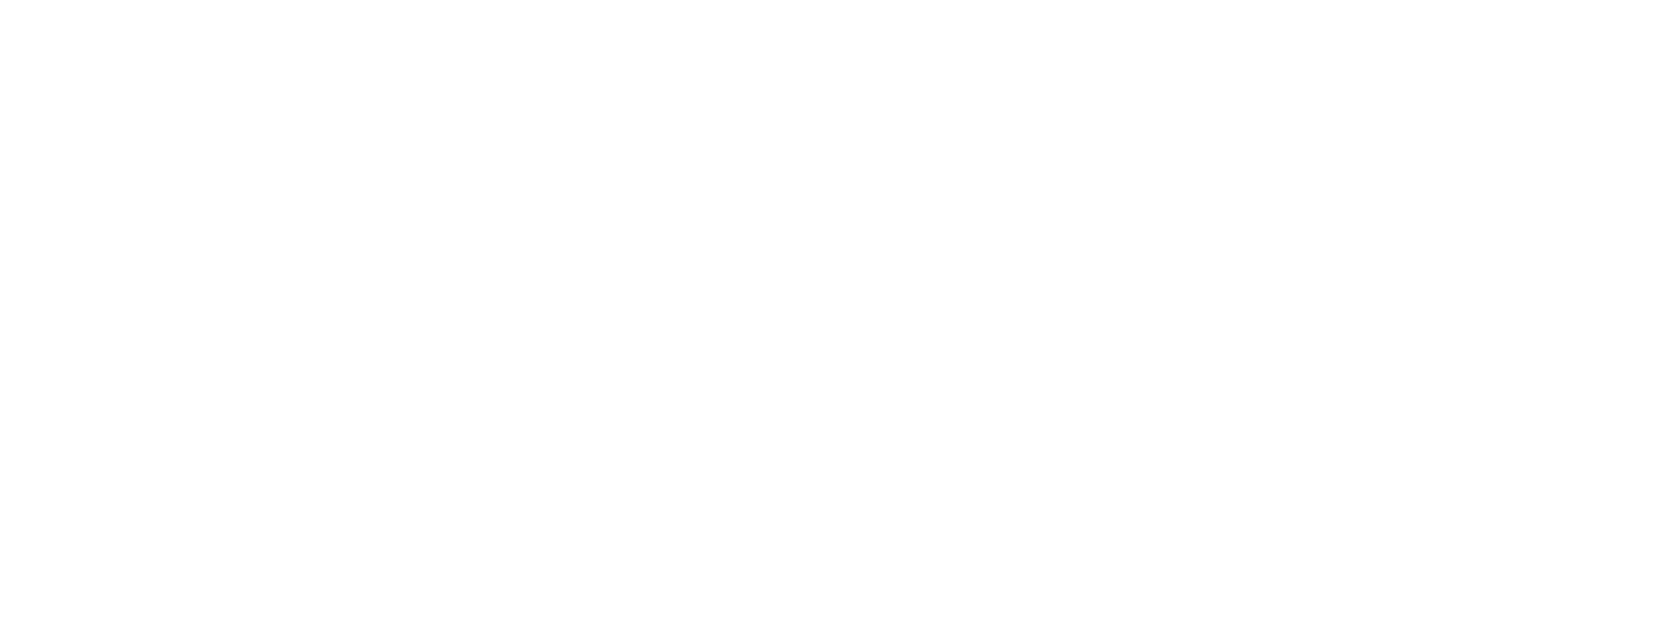 Hawkins Spizman